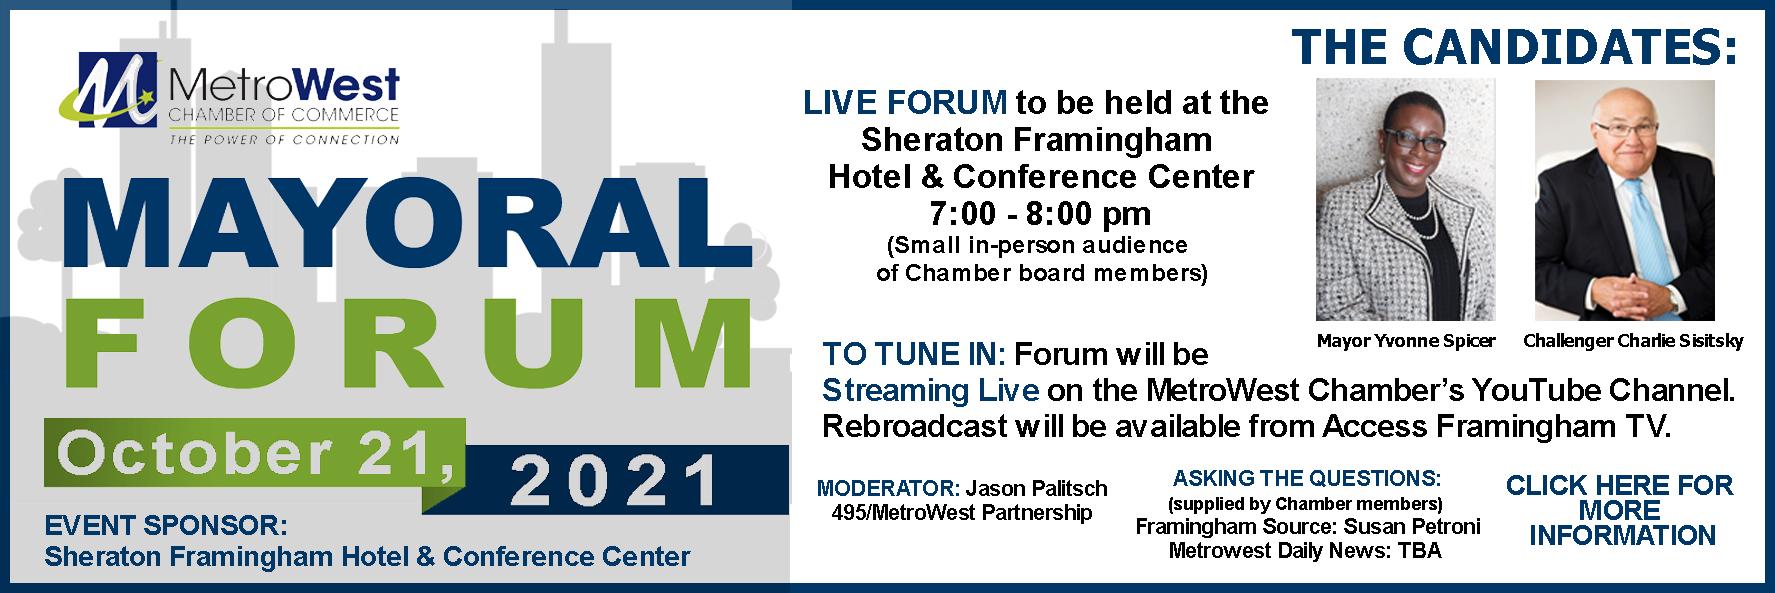 10-21-21-Mayoral-Forum-Web-Slider(3).jpg